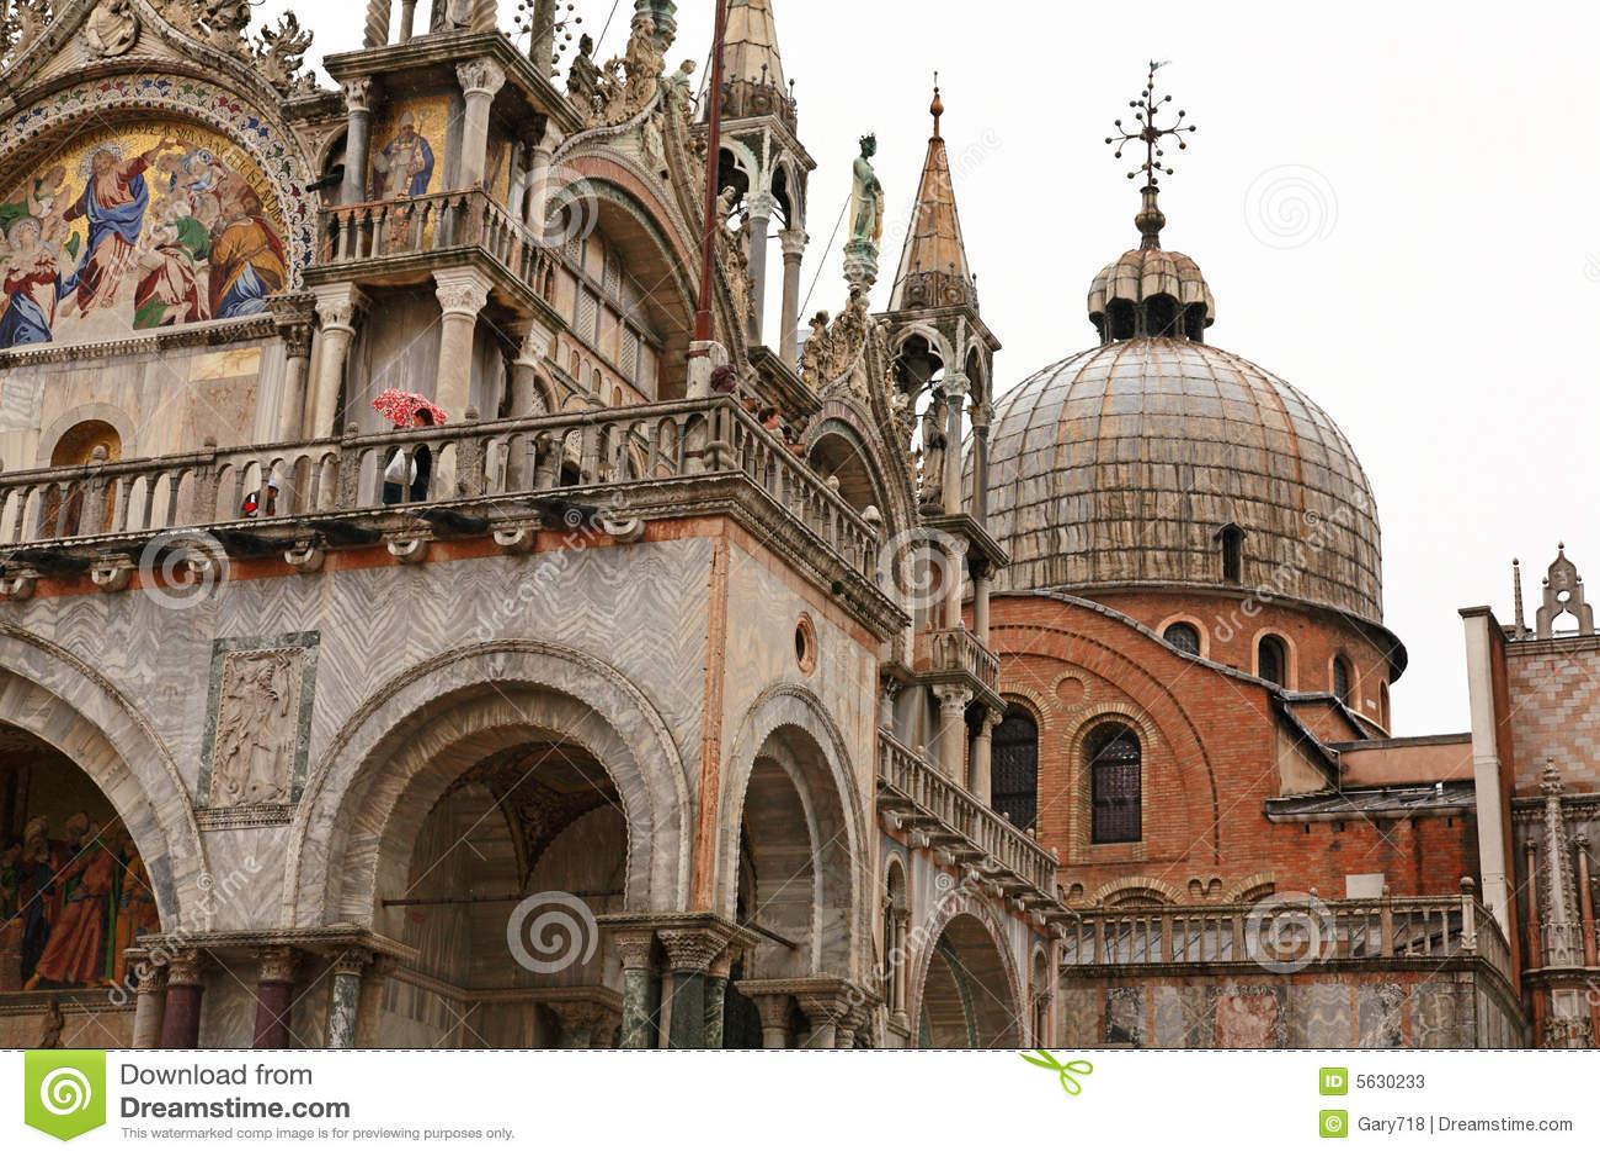 The San Marco Plaza Venice